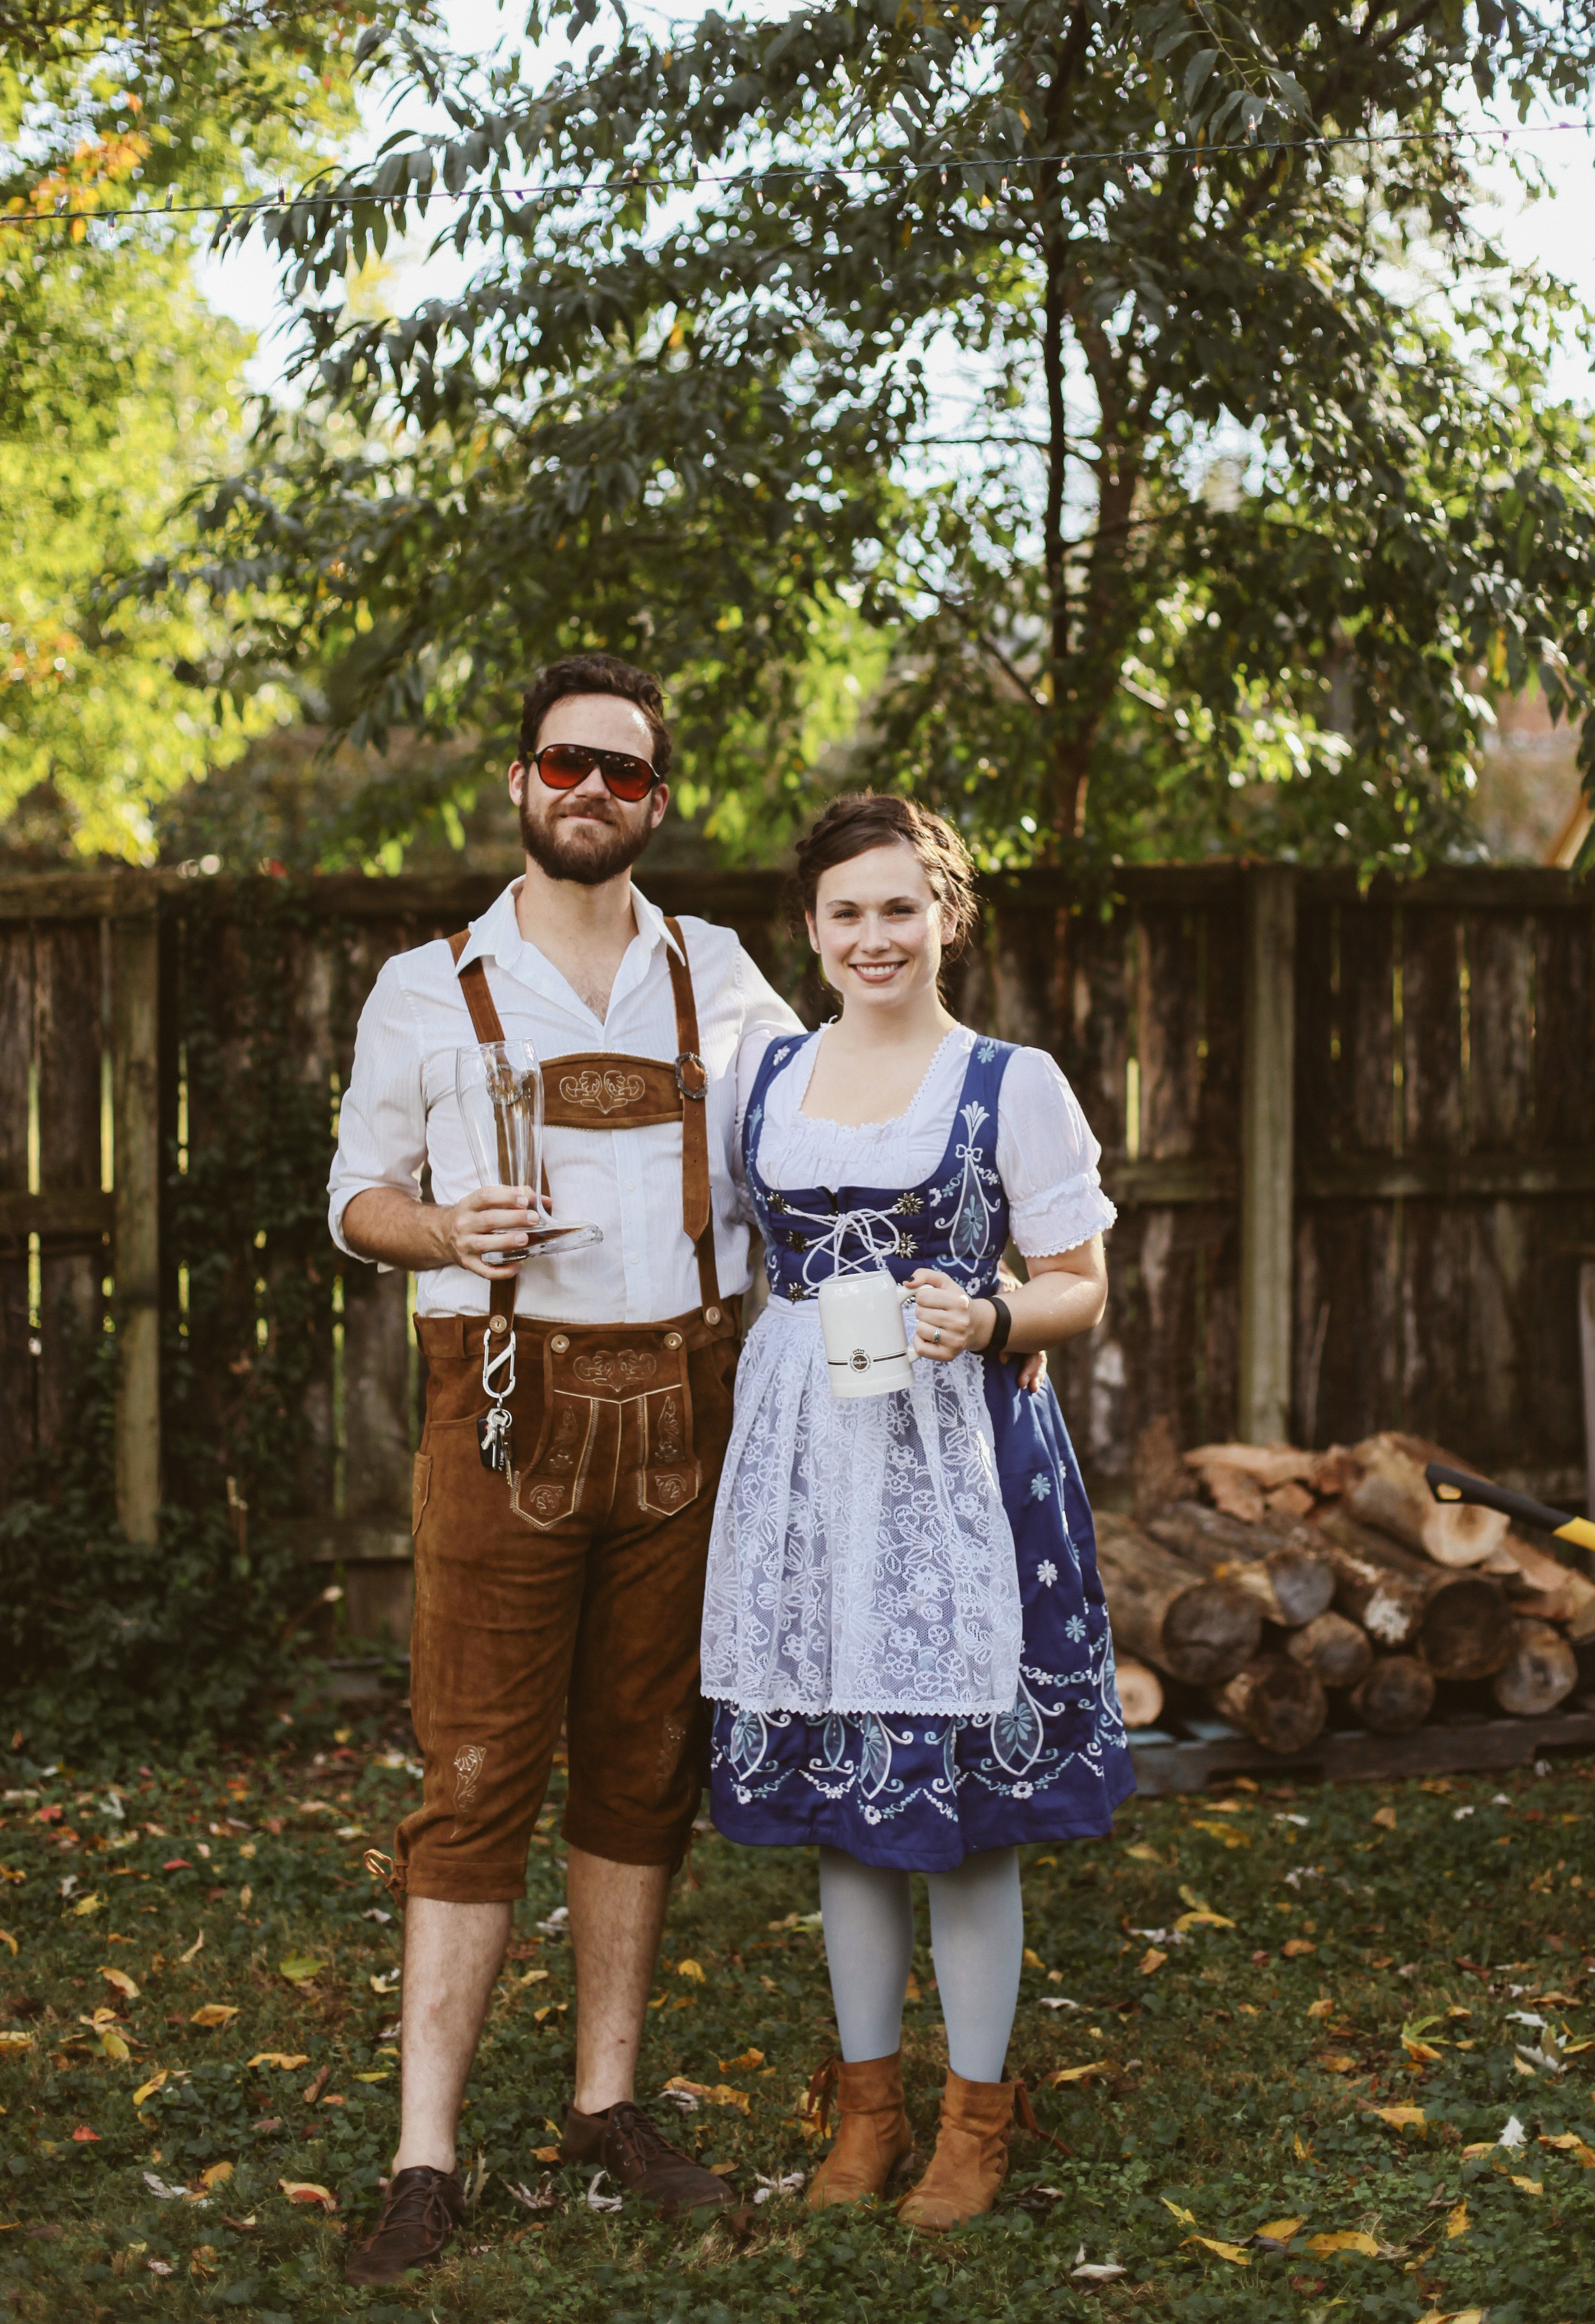 David and Emma Supica - Oktoberfest's Original Co-conspirators